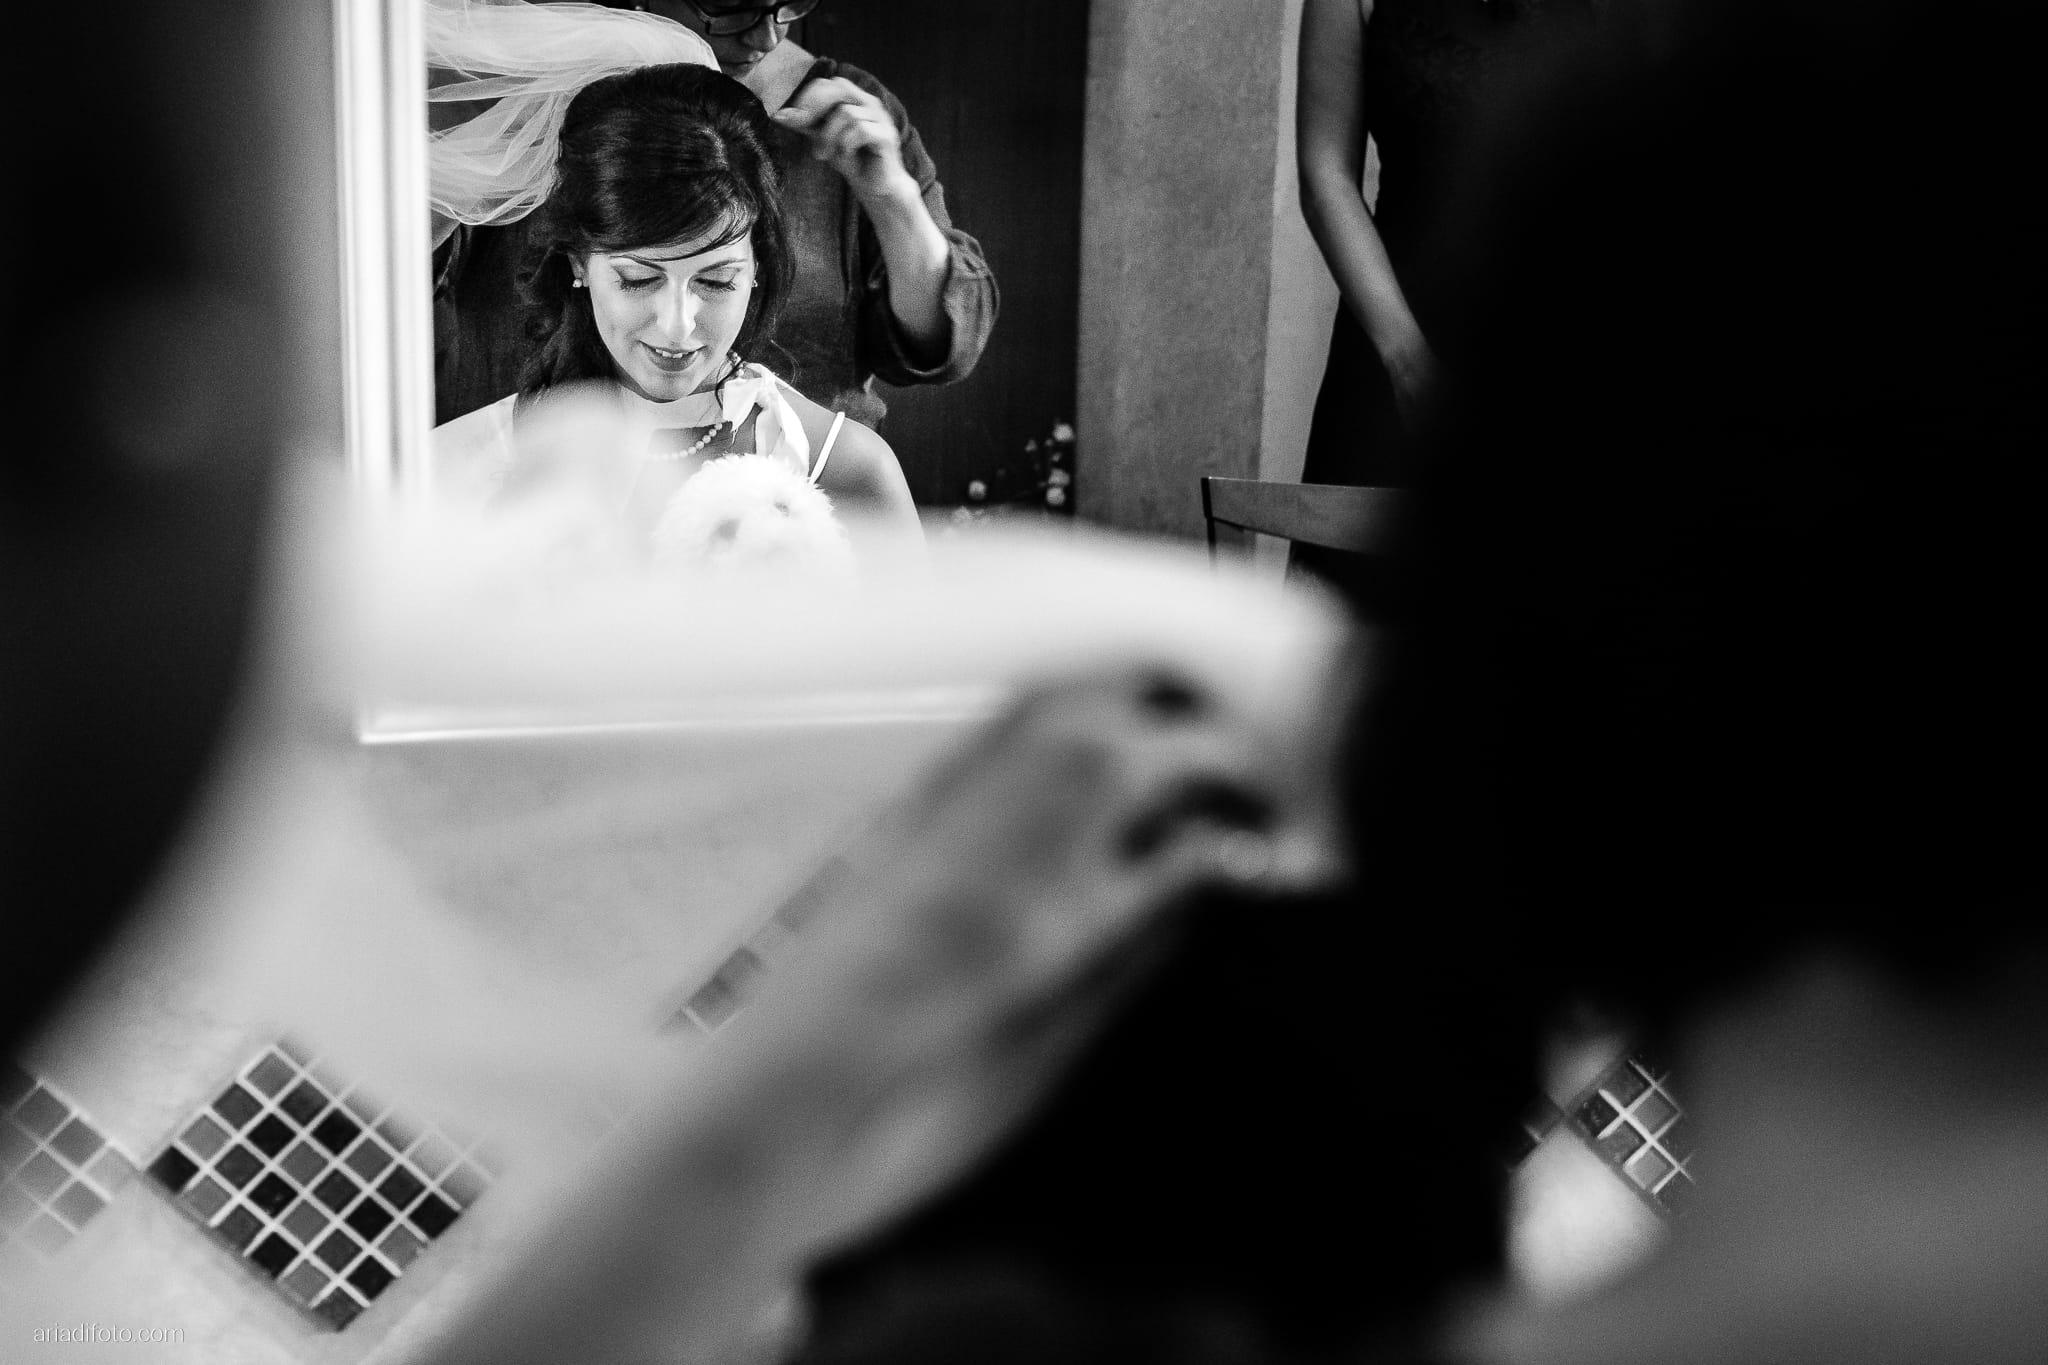 Rosylenia Luca Matrimonio Duino Ristorante Napoleone Castions Udine preparativi sposa specchio riflesso velo